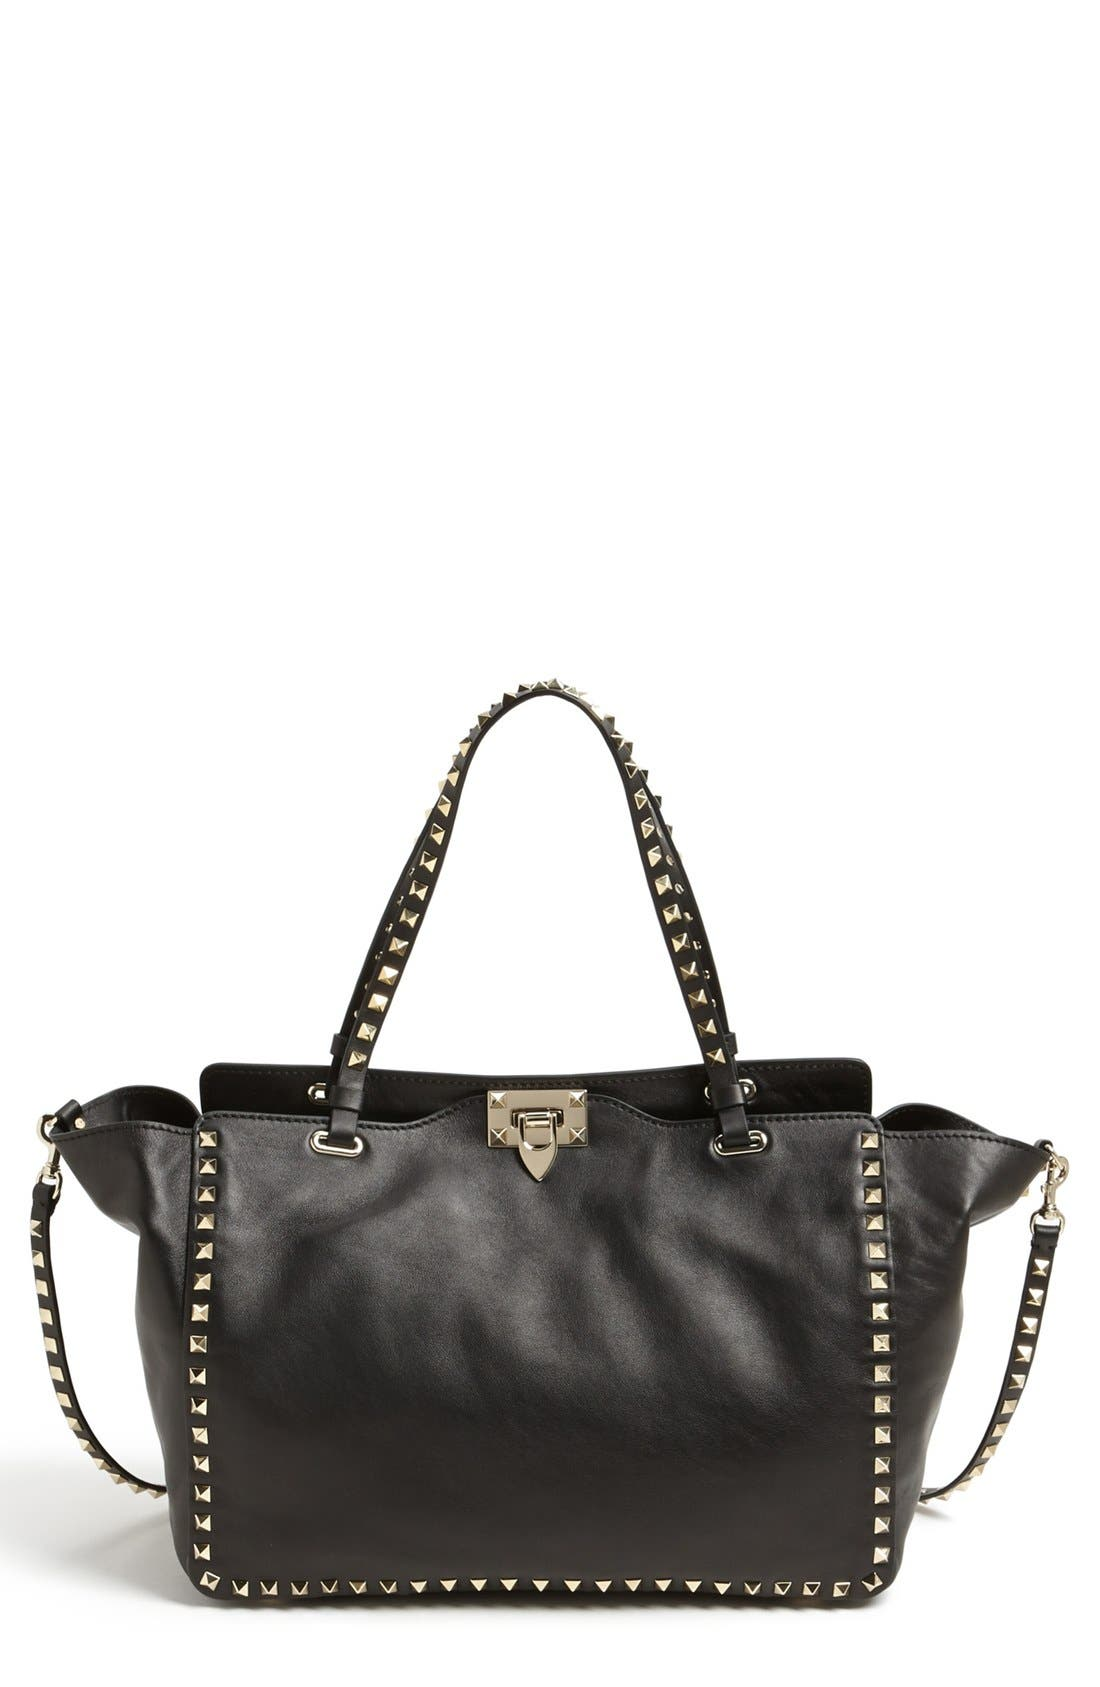 Main Image - Valentino 'Medium Rockstud' Double Handle Leather Tote